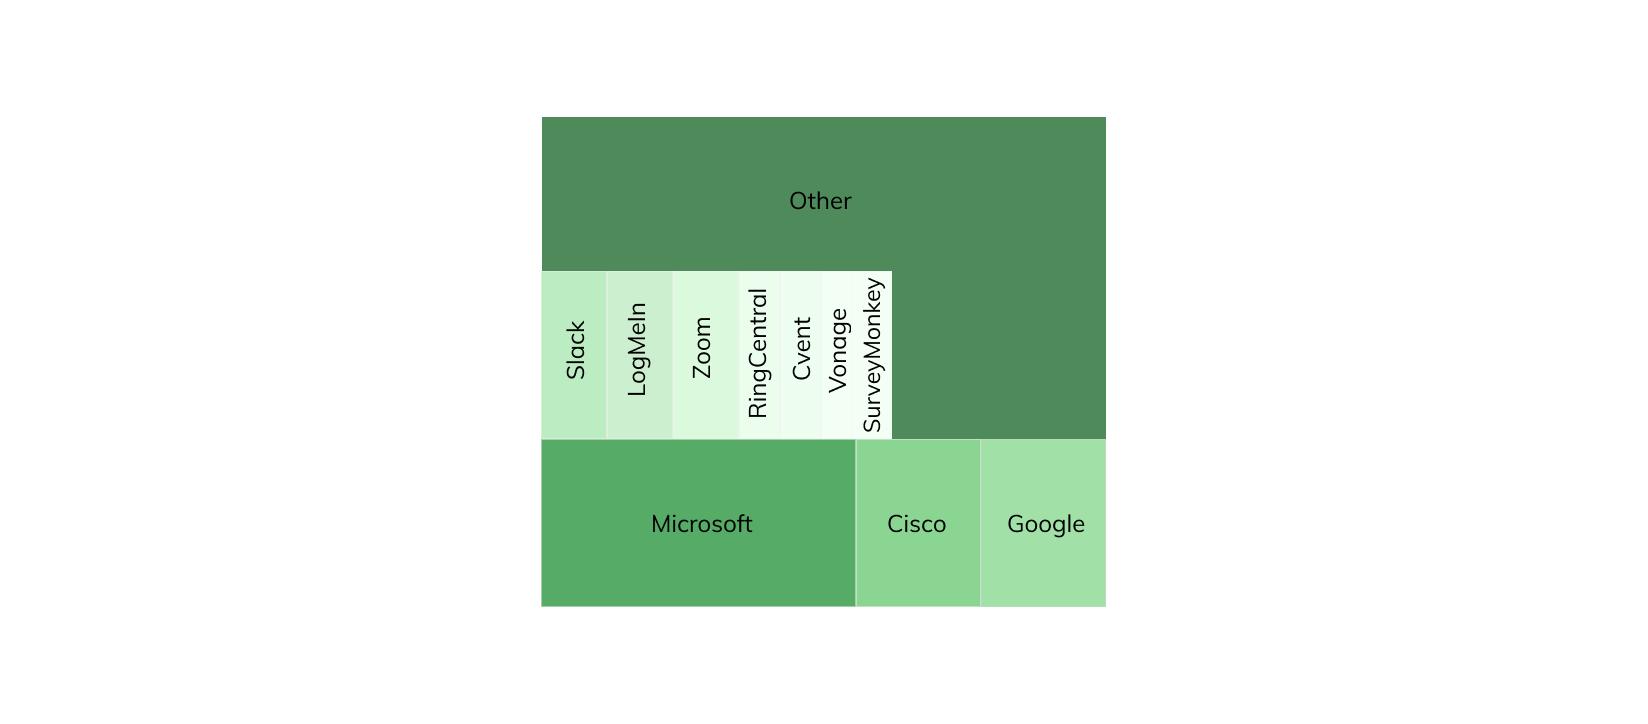 Collaboration Tools Market Share